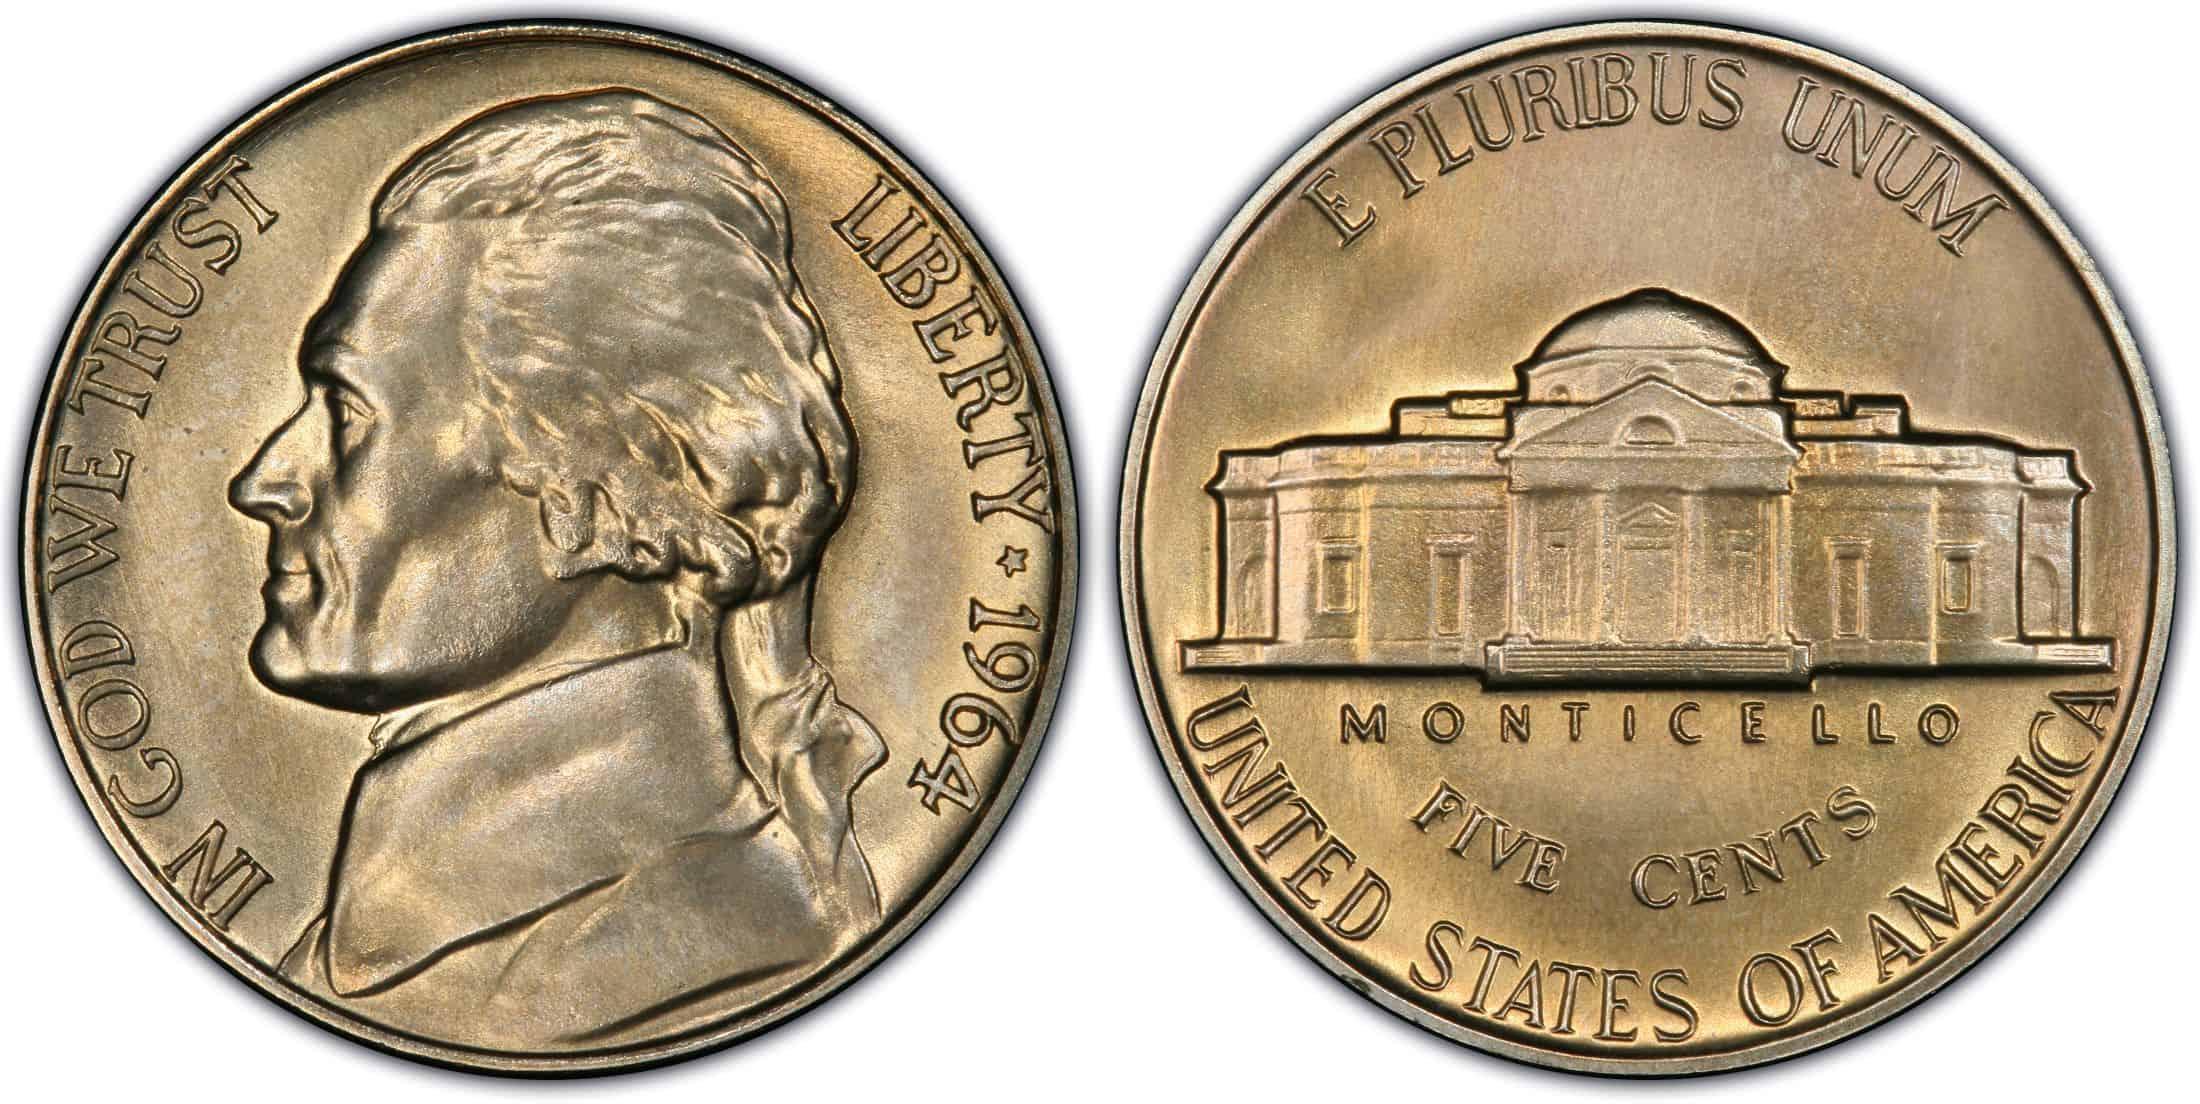 What Is 1964 Jefferson Nickel